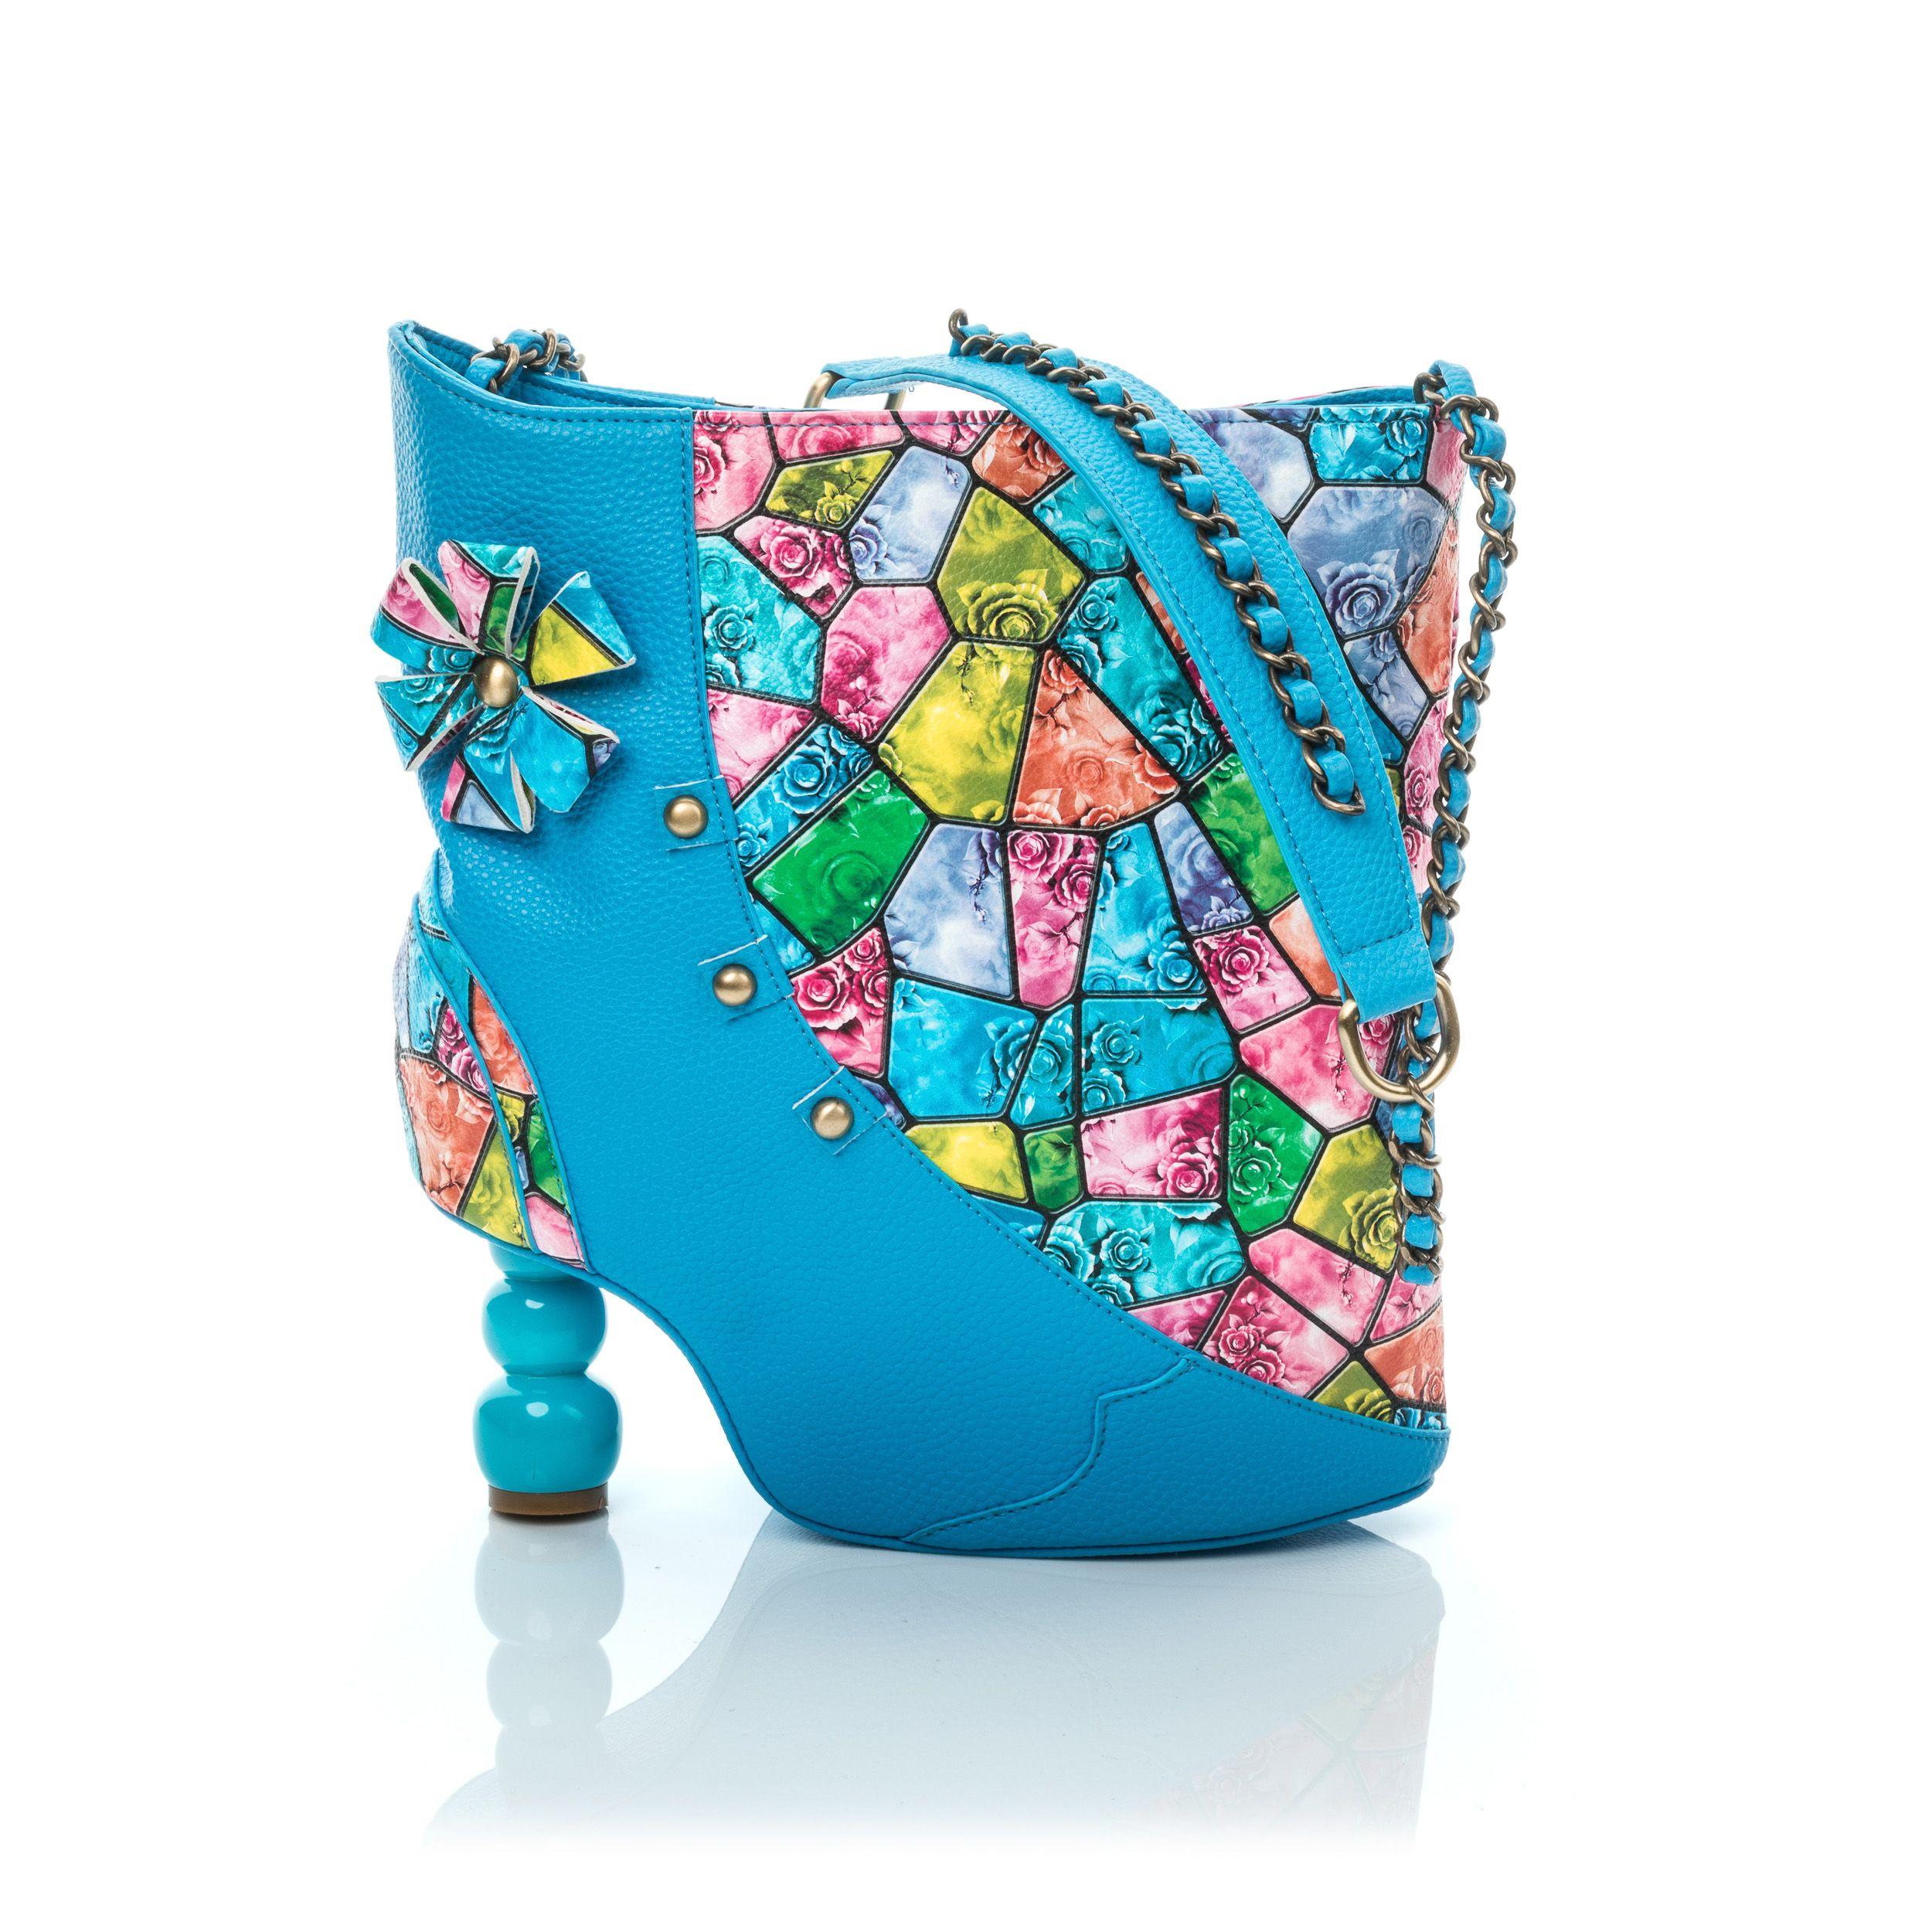 Maroquinerie Besson 917038 Printemps Été Chaussures 2017 qEwE7vpan